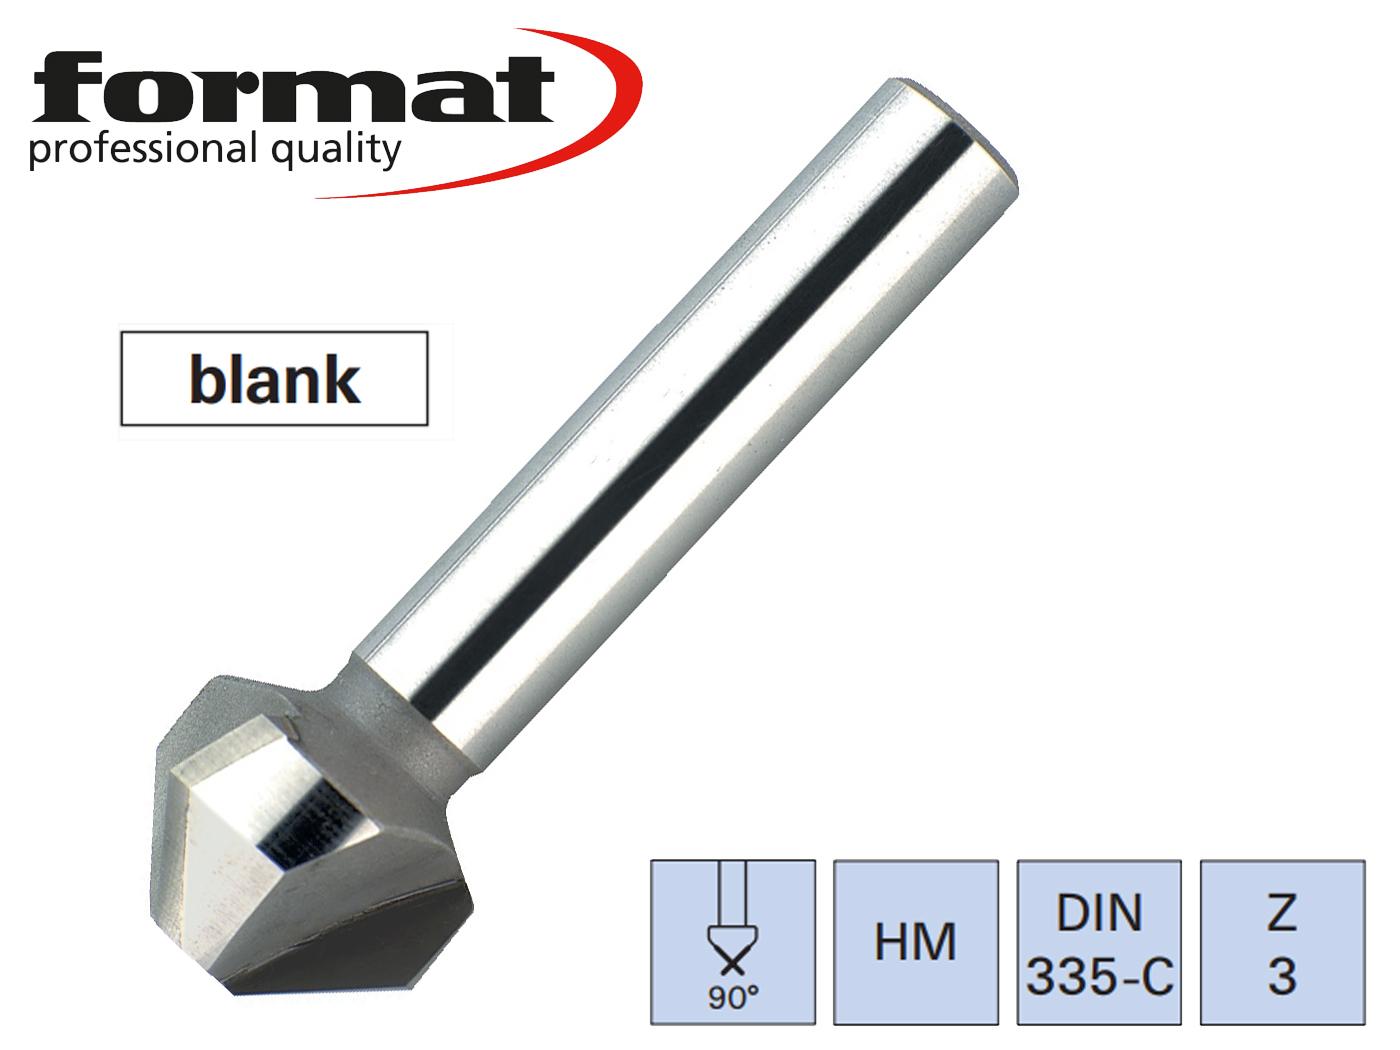 verzinkboor DIN 335C VHM 90G FORMAT   DKMTools - DKM Tools